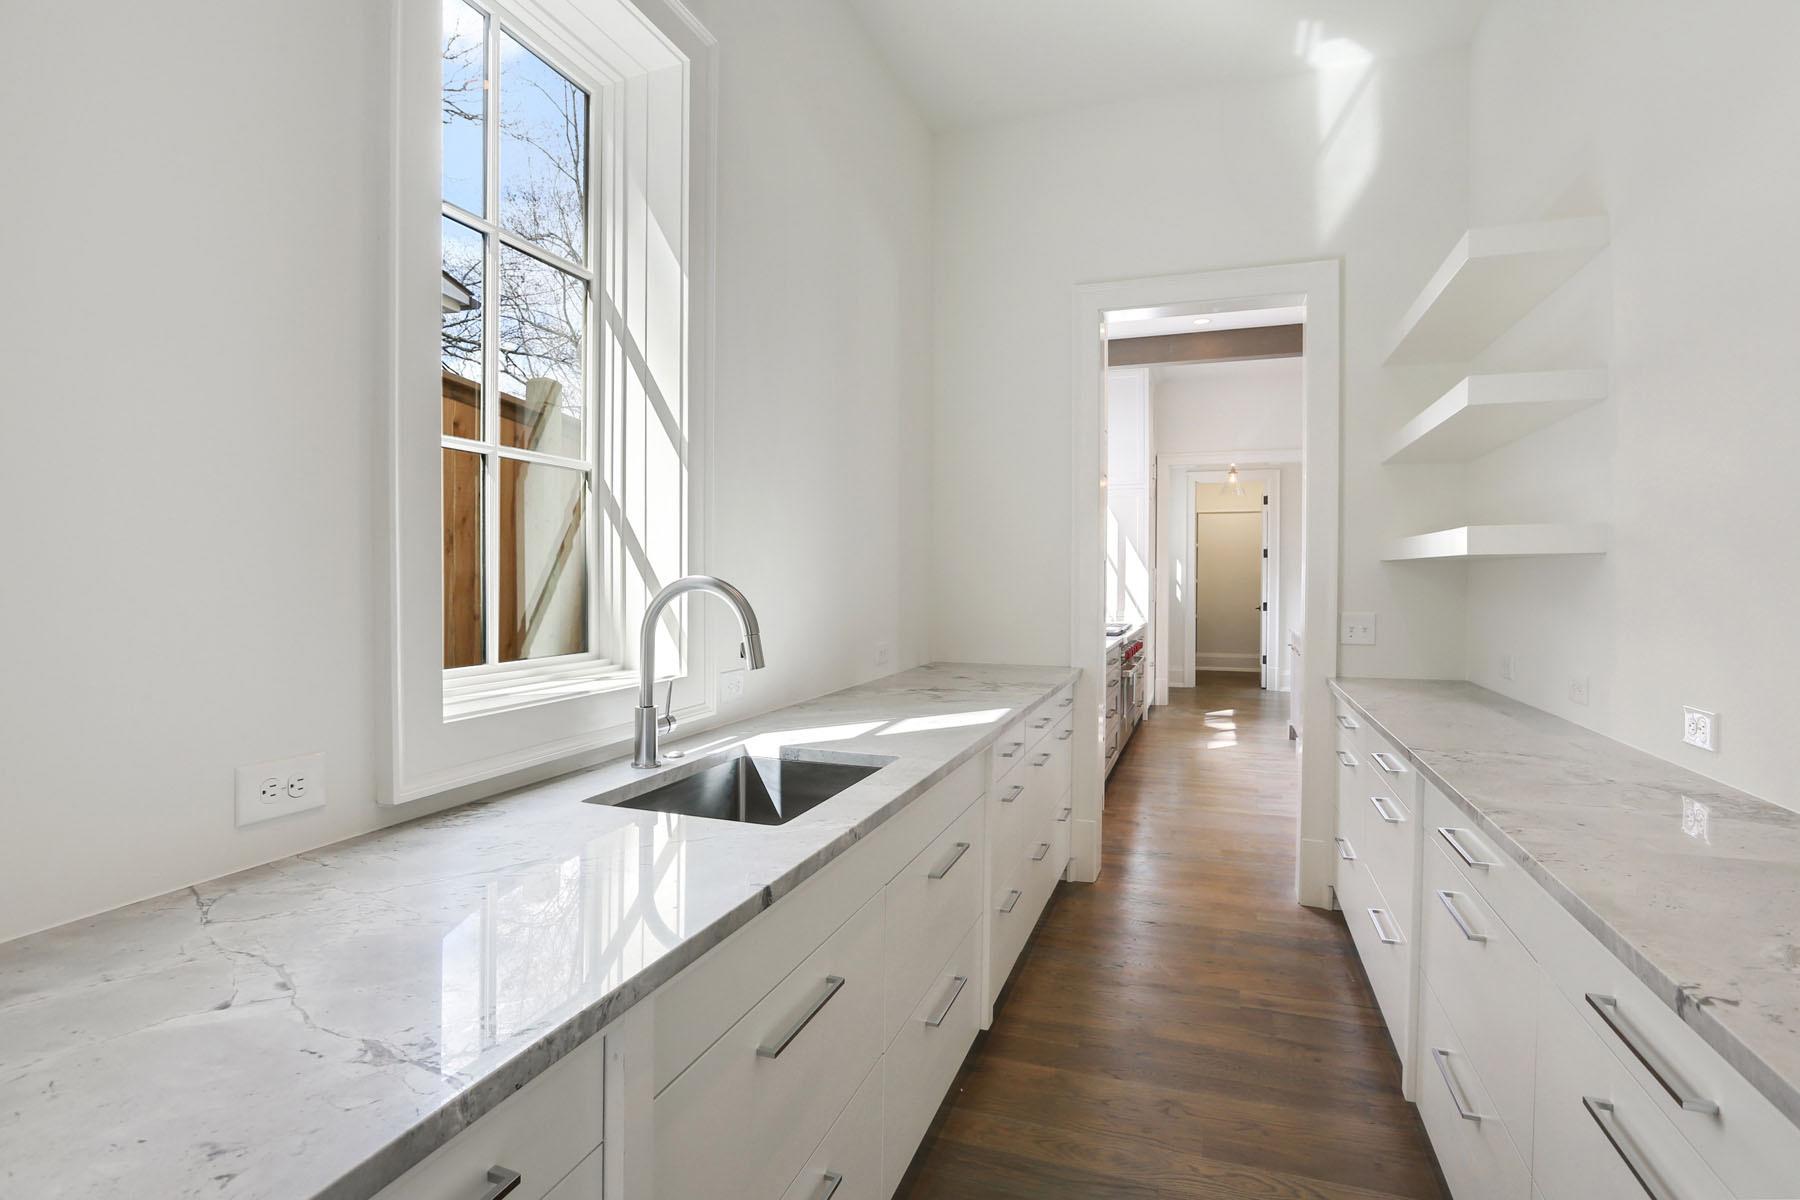 Additional photo for property listing at Stunning Custom Home in Ansley Park 284, The Prado NE Atlanta, Georgien 30309 Förenta staterna